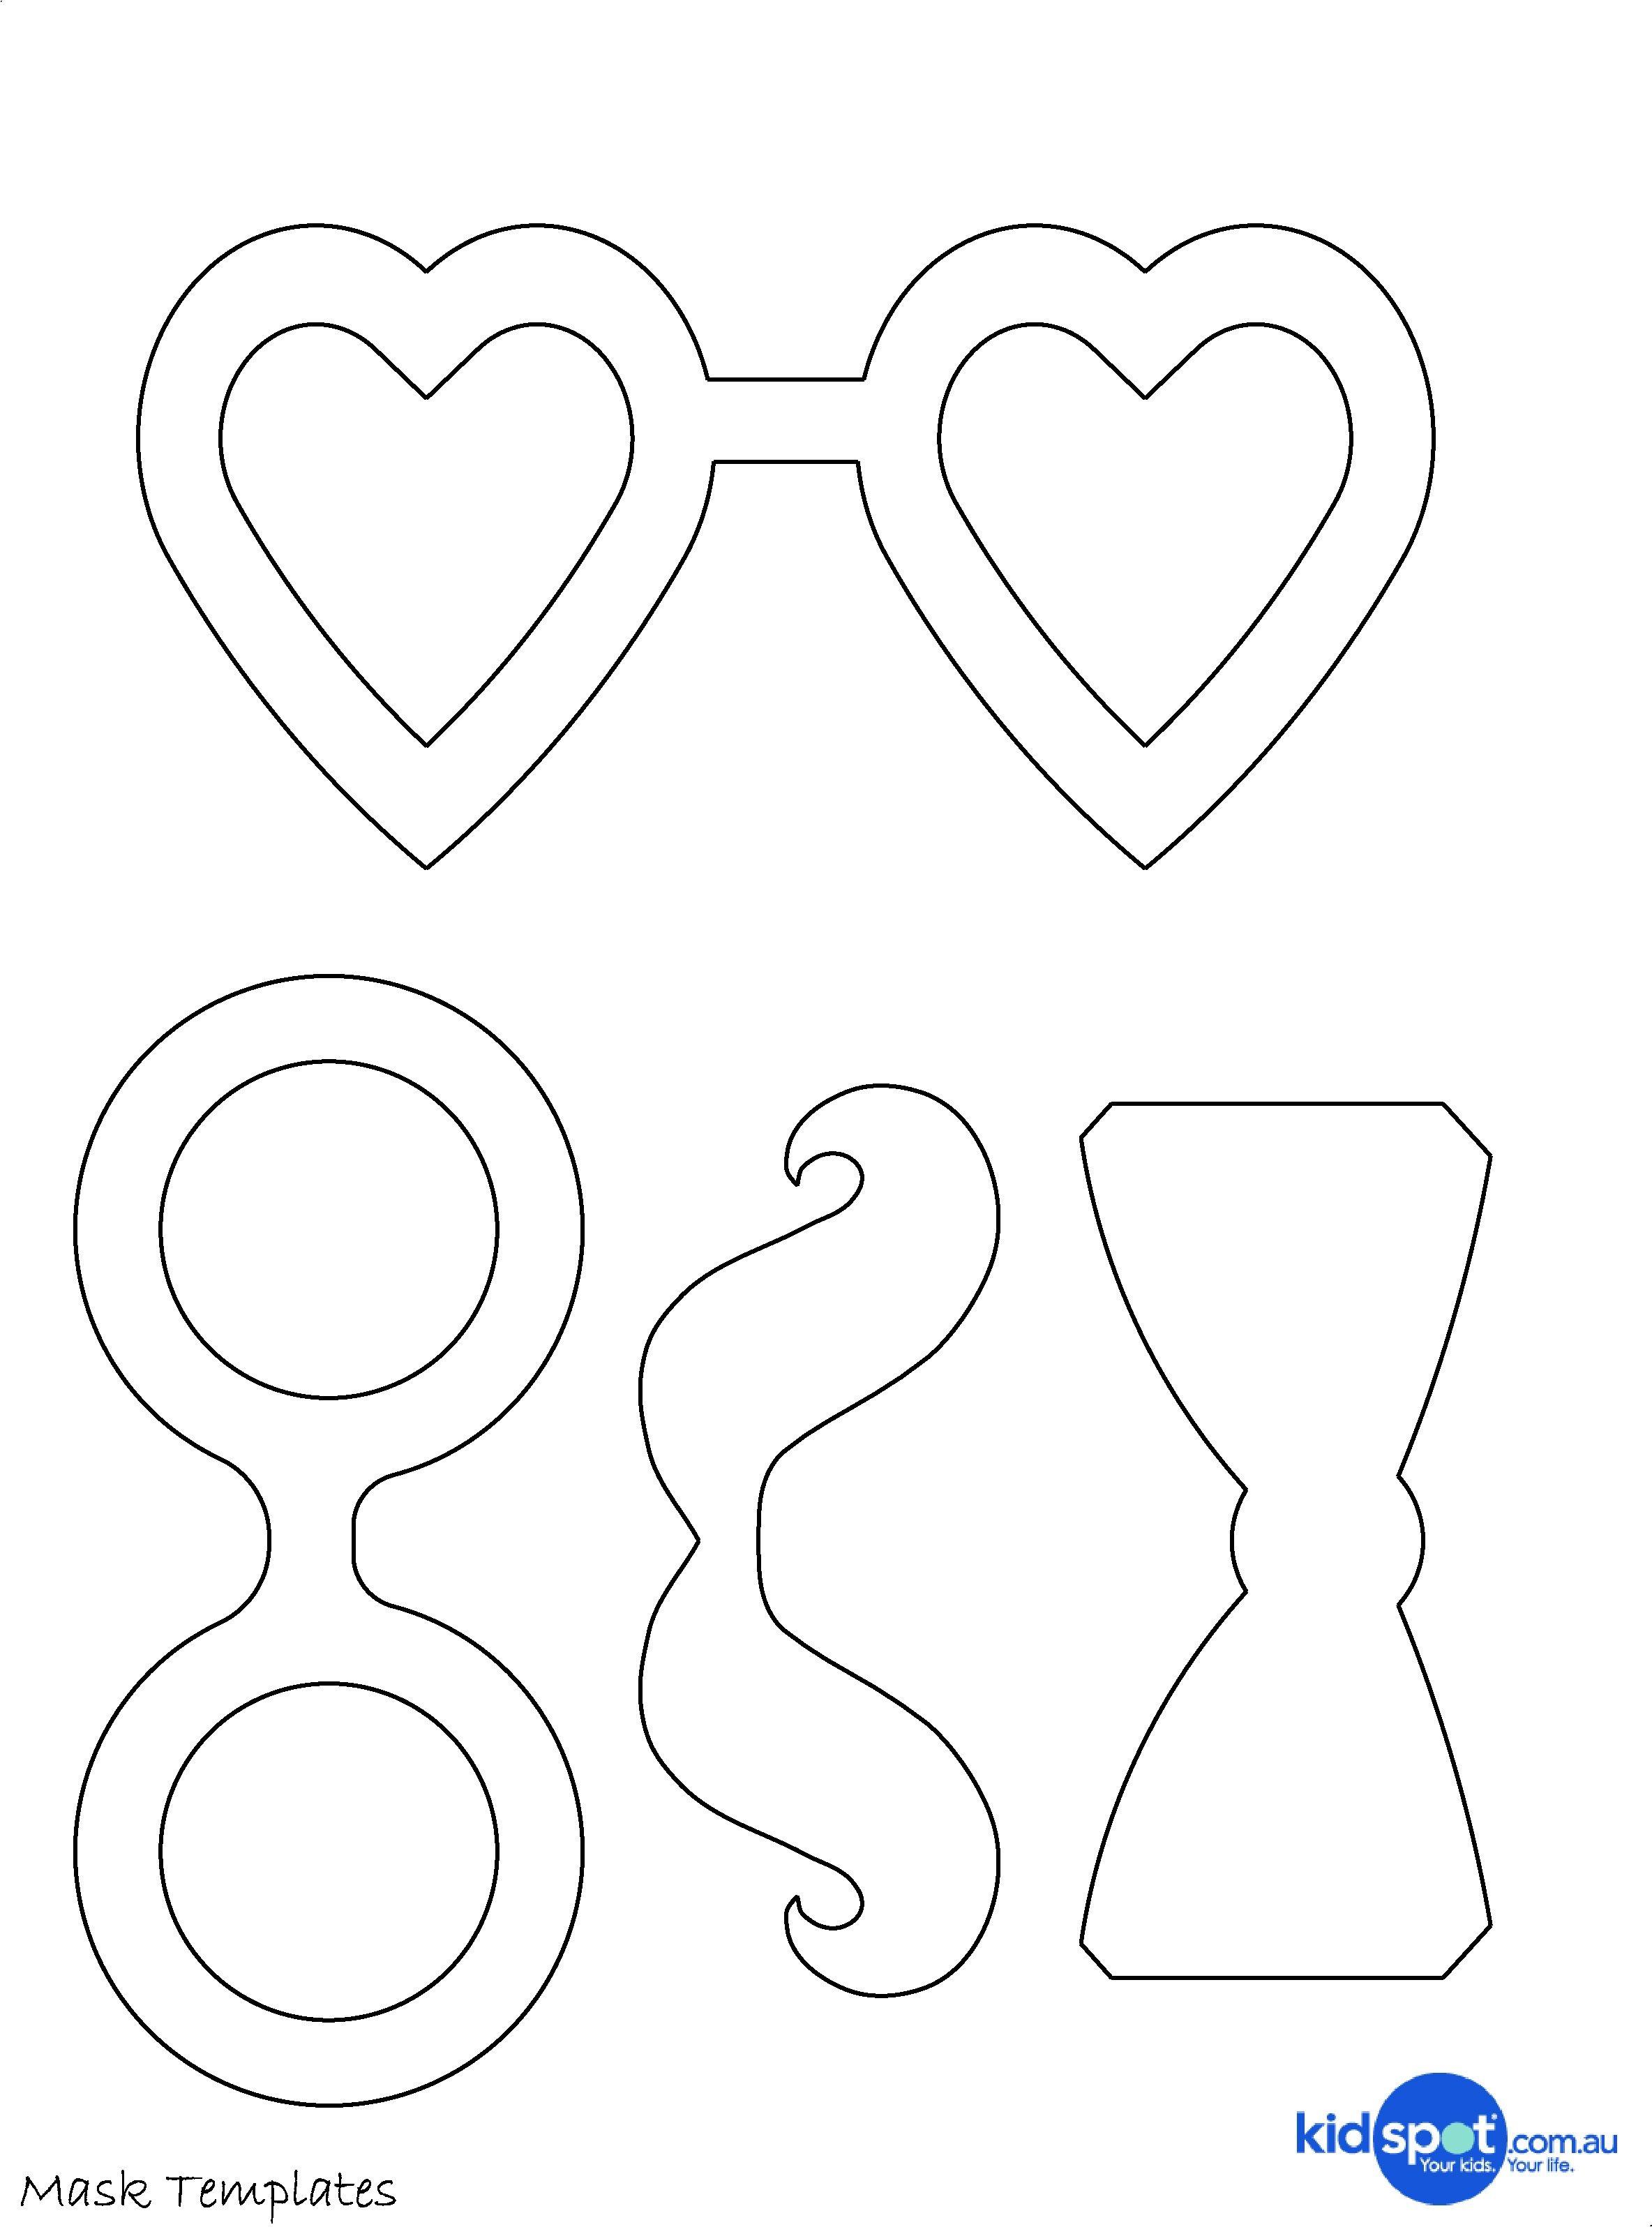 Tie Pattern Printable | Quirky Artist Loft: Free Printable Kids Mask - Free Printable Tie Template